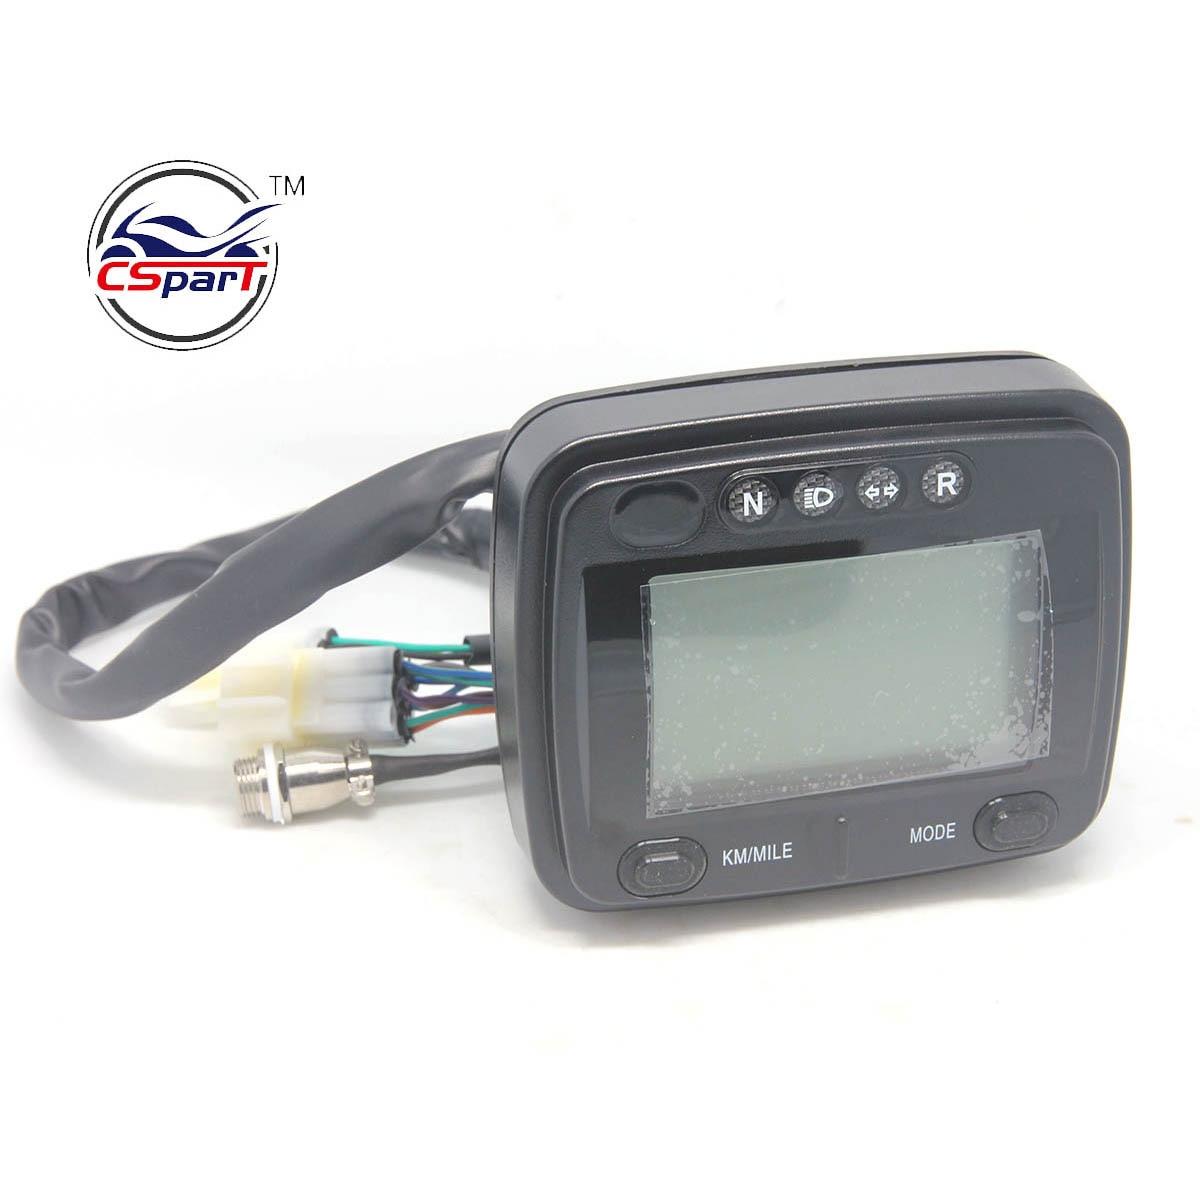 Buyang Feishen 300CC ATV Quad Speedometer Speed Meter Assy Instrument D300 G300 H300 5.1.01.0012